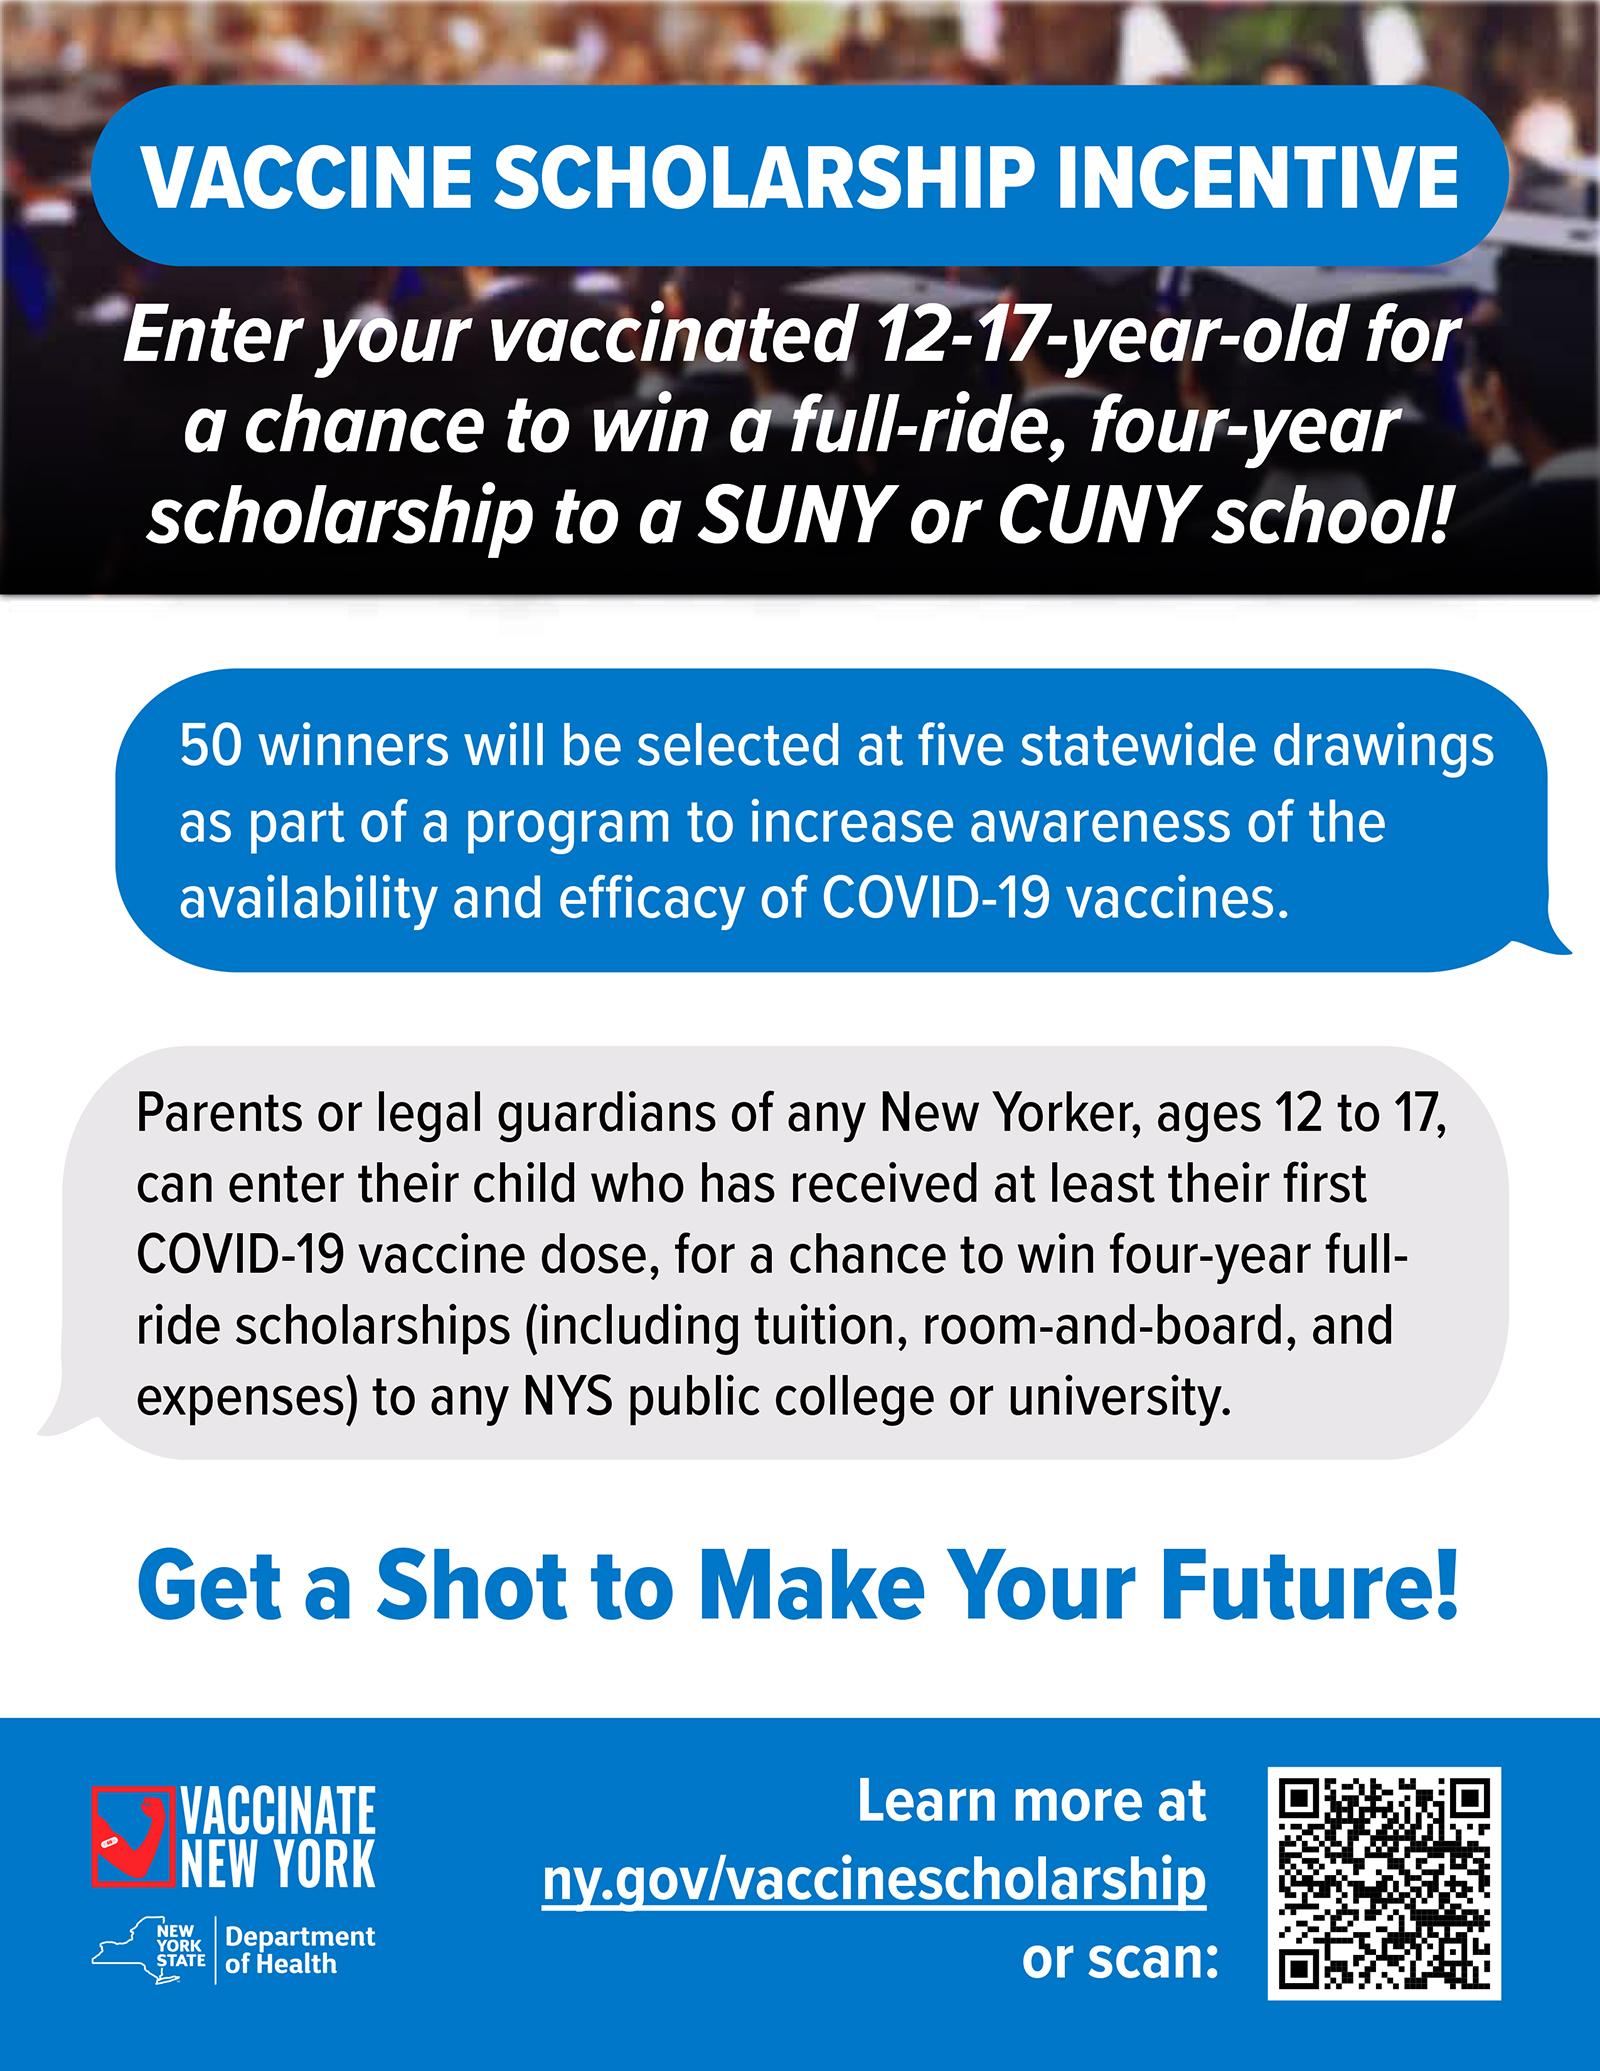 Vaccine Scholarship Incentive Flyer (6/2021)